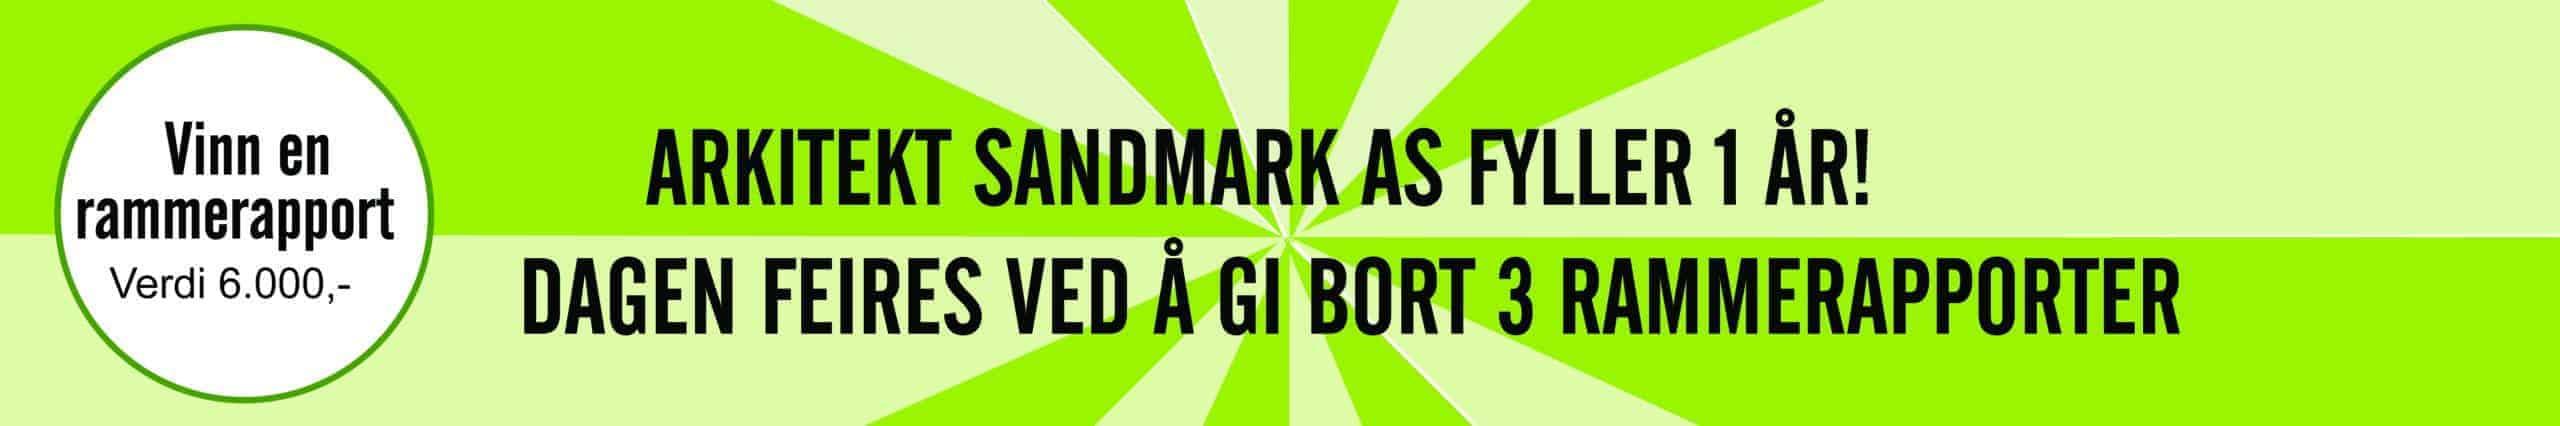 Kampanje hos Arkitekt Sandmark AS